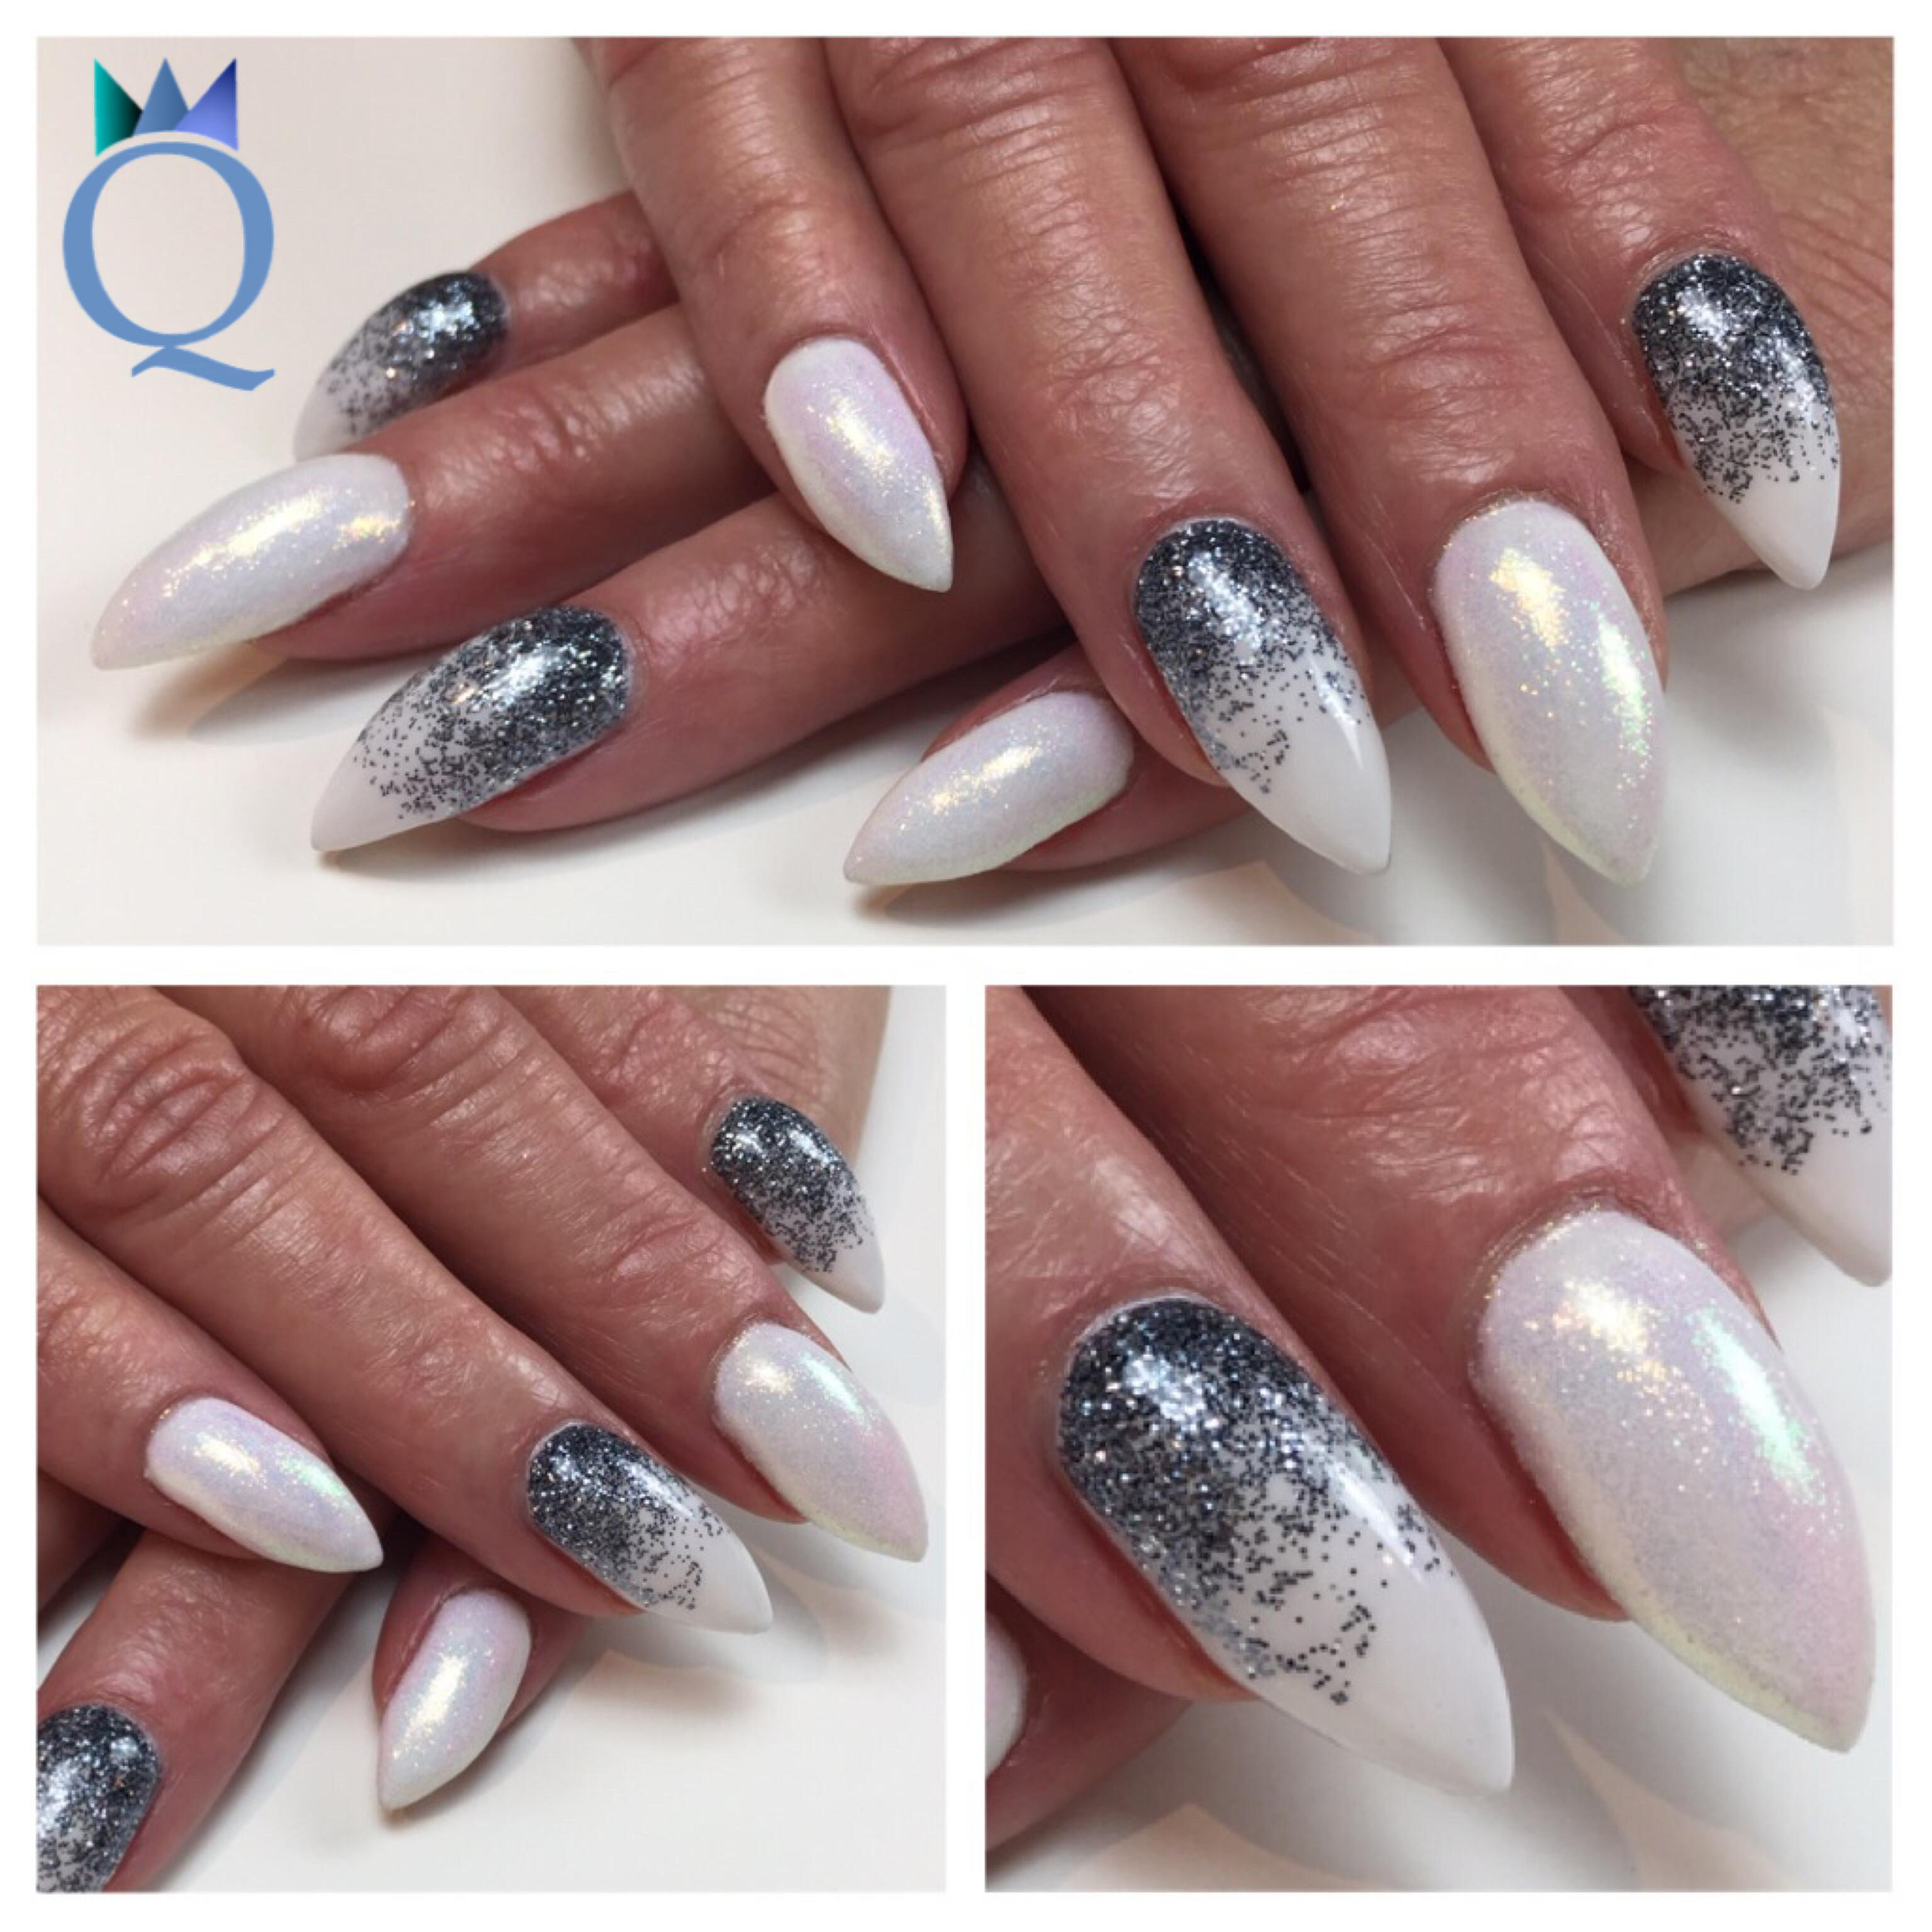 almondnails #gelnails #nails #white #mermaidpigment #custommade ...